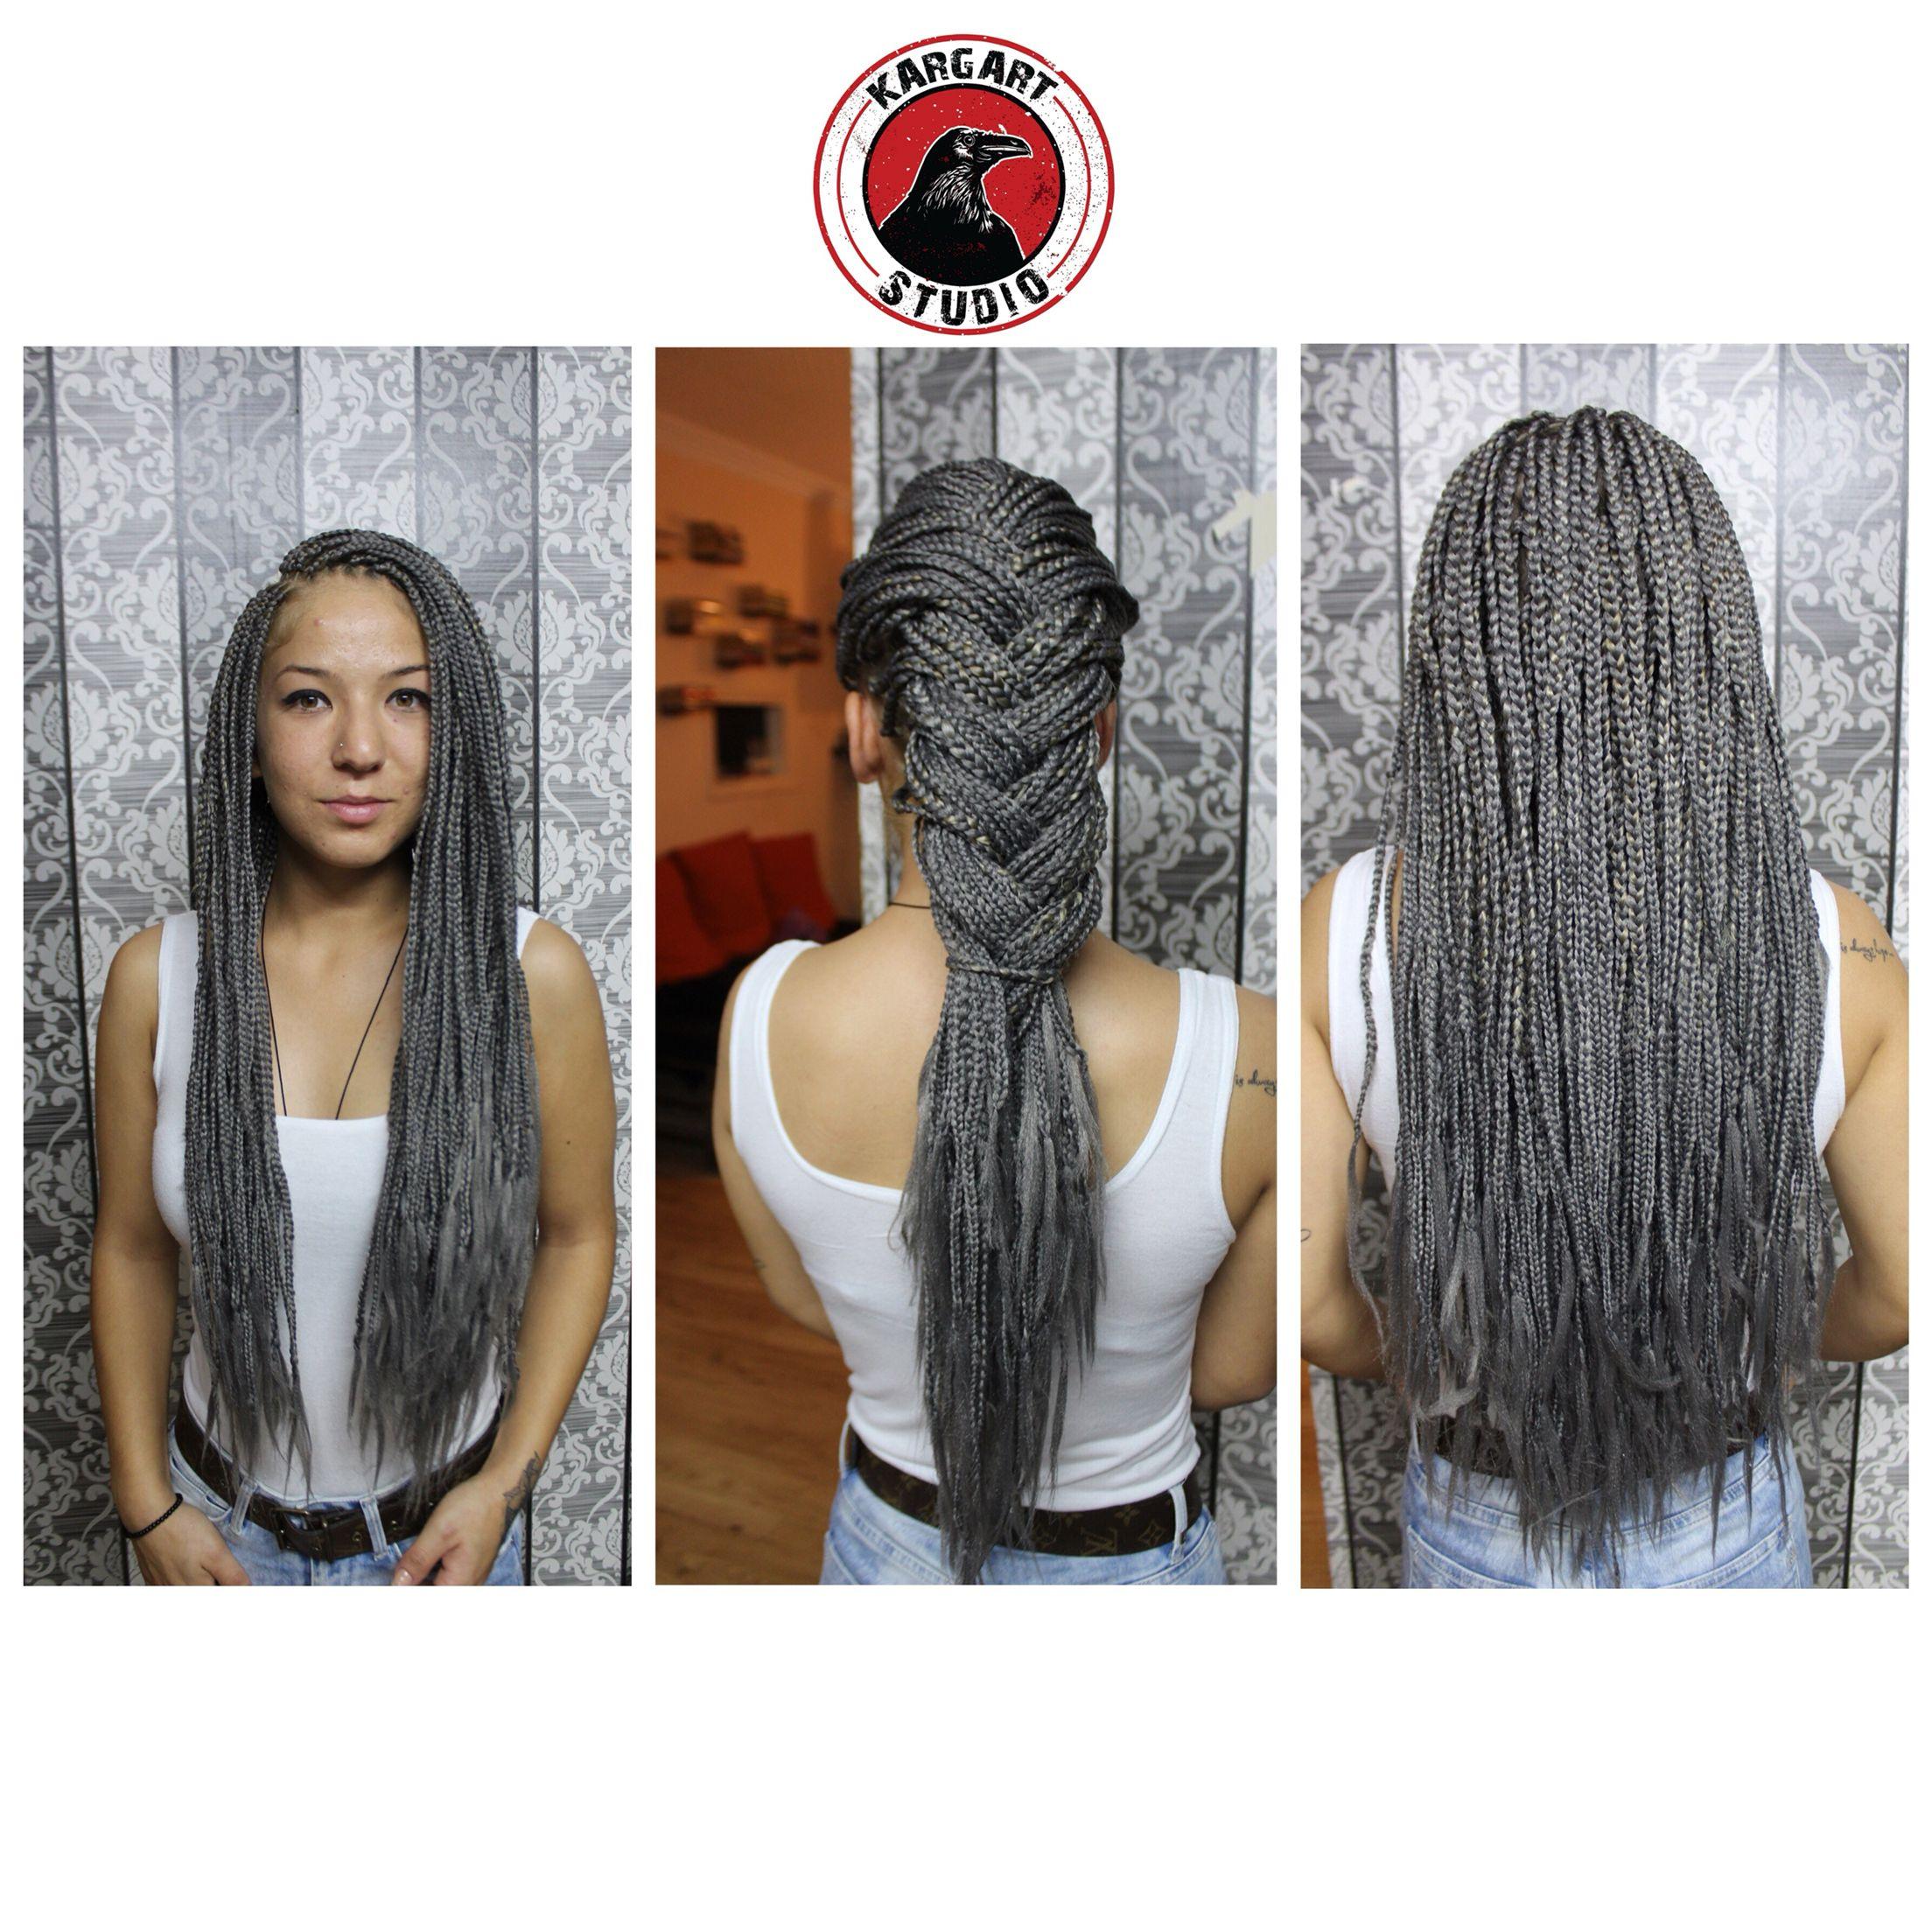 Pin by stephanie chamberlain on hair styles pinterest hair